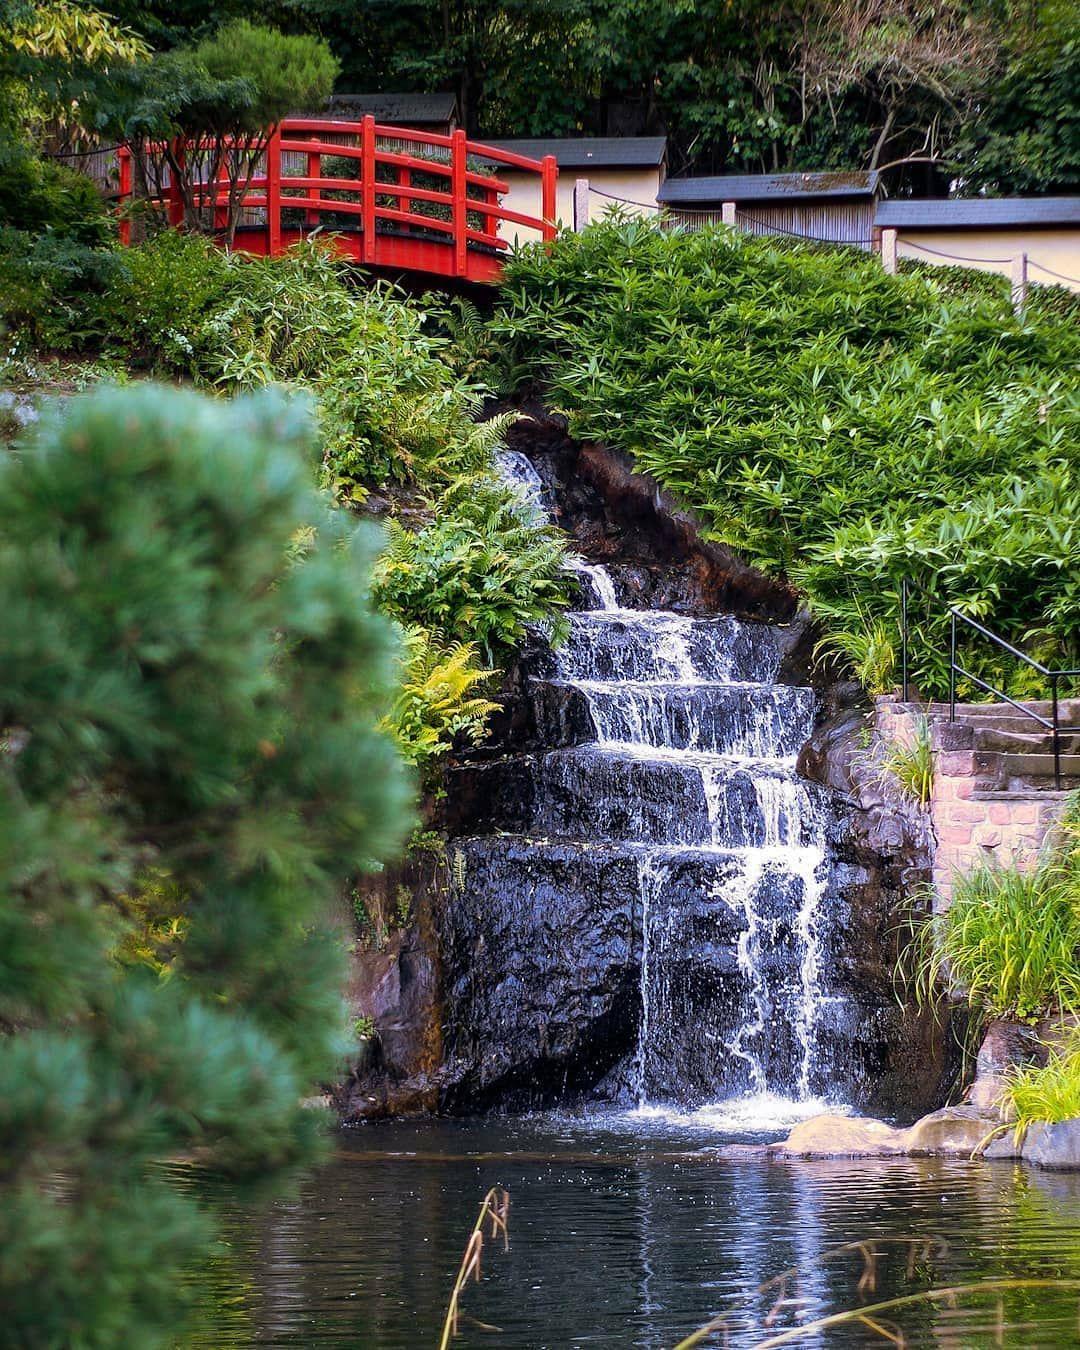 Kevinprovo Japanischer Garten Kaiserslautern Japanischergarten Brucke Rotebrucke Visitlautern War Japanischer Garten Garten Gartenbrucken